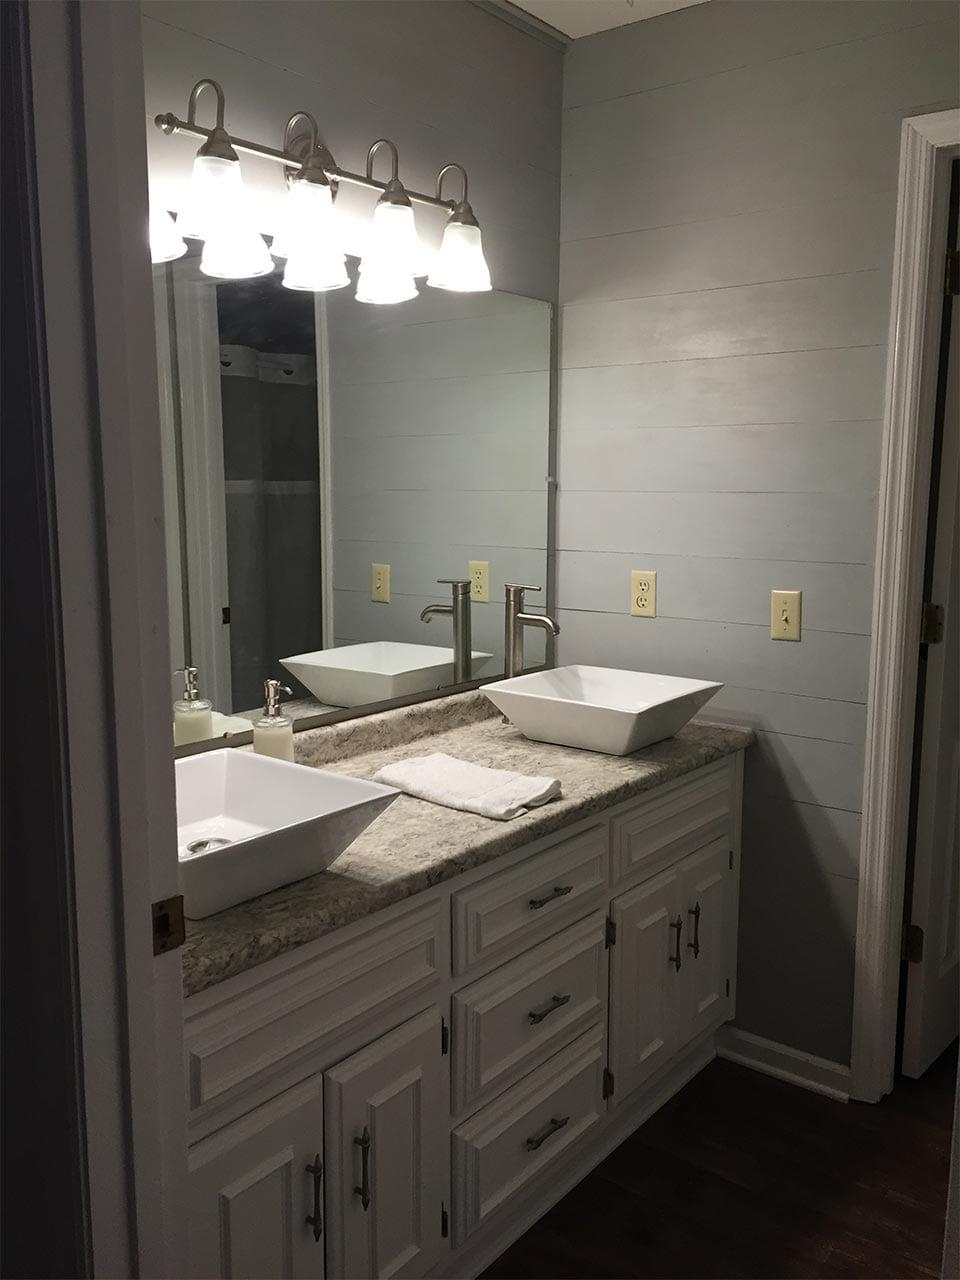 1980's Condo Make Over Bathroom update